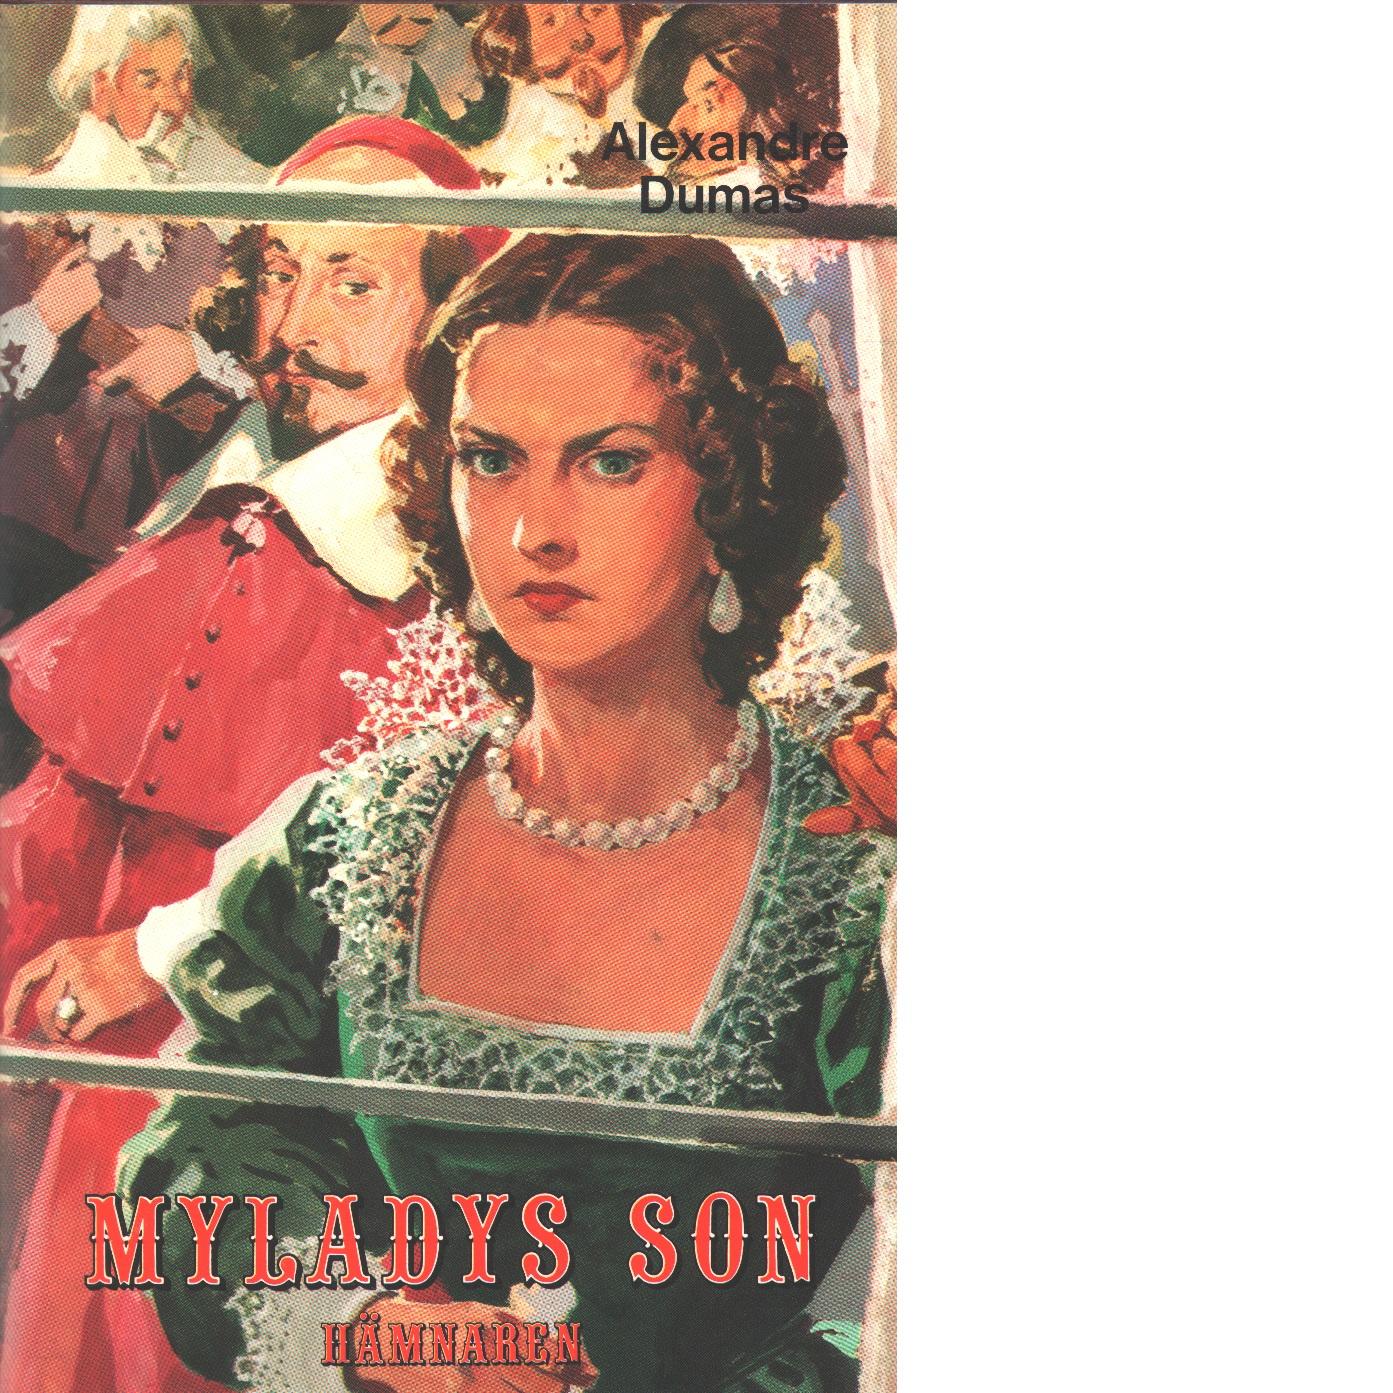 Myladys son eller Tjugo år efteråt. D. 2, Hämnaren - Dumas, Alexandre